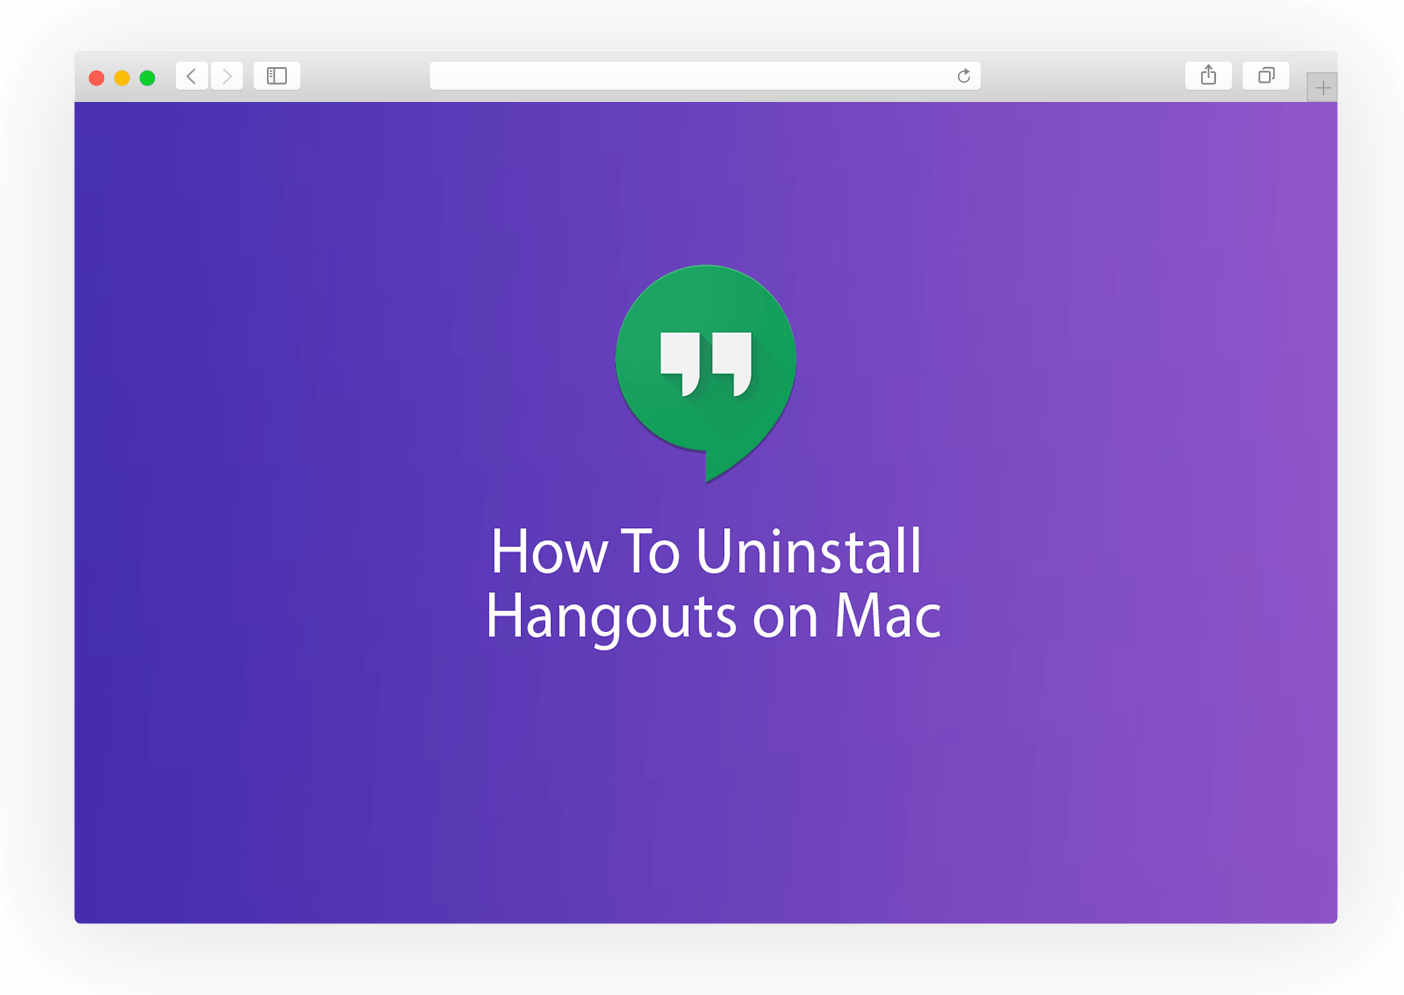 Uninstall Hangouts Mac] How To Uninstall Google Hangouts Desktop App